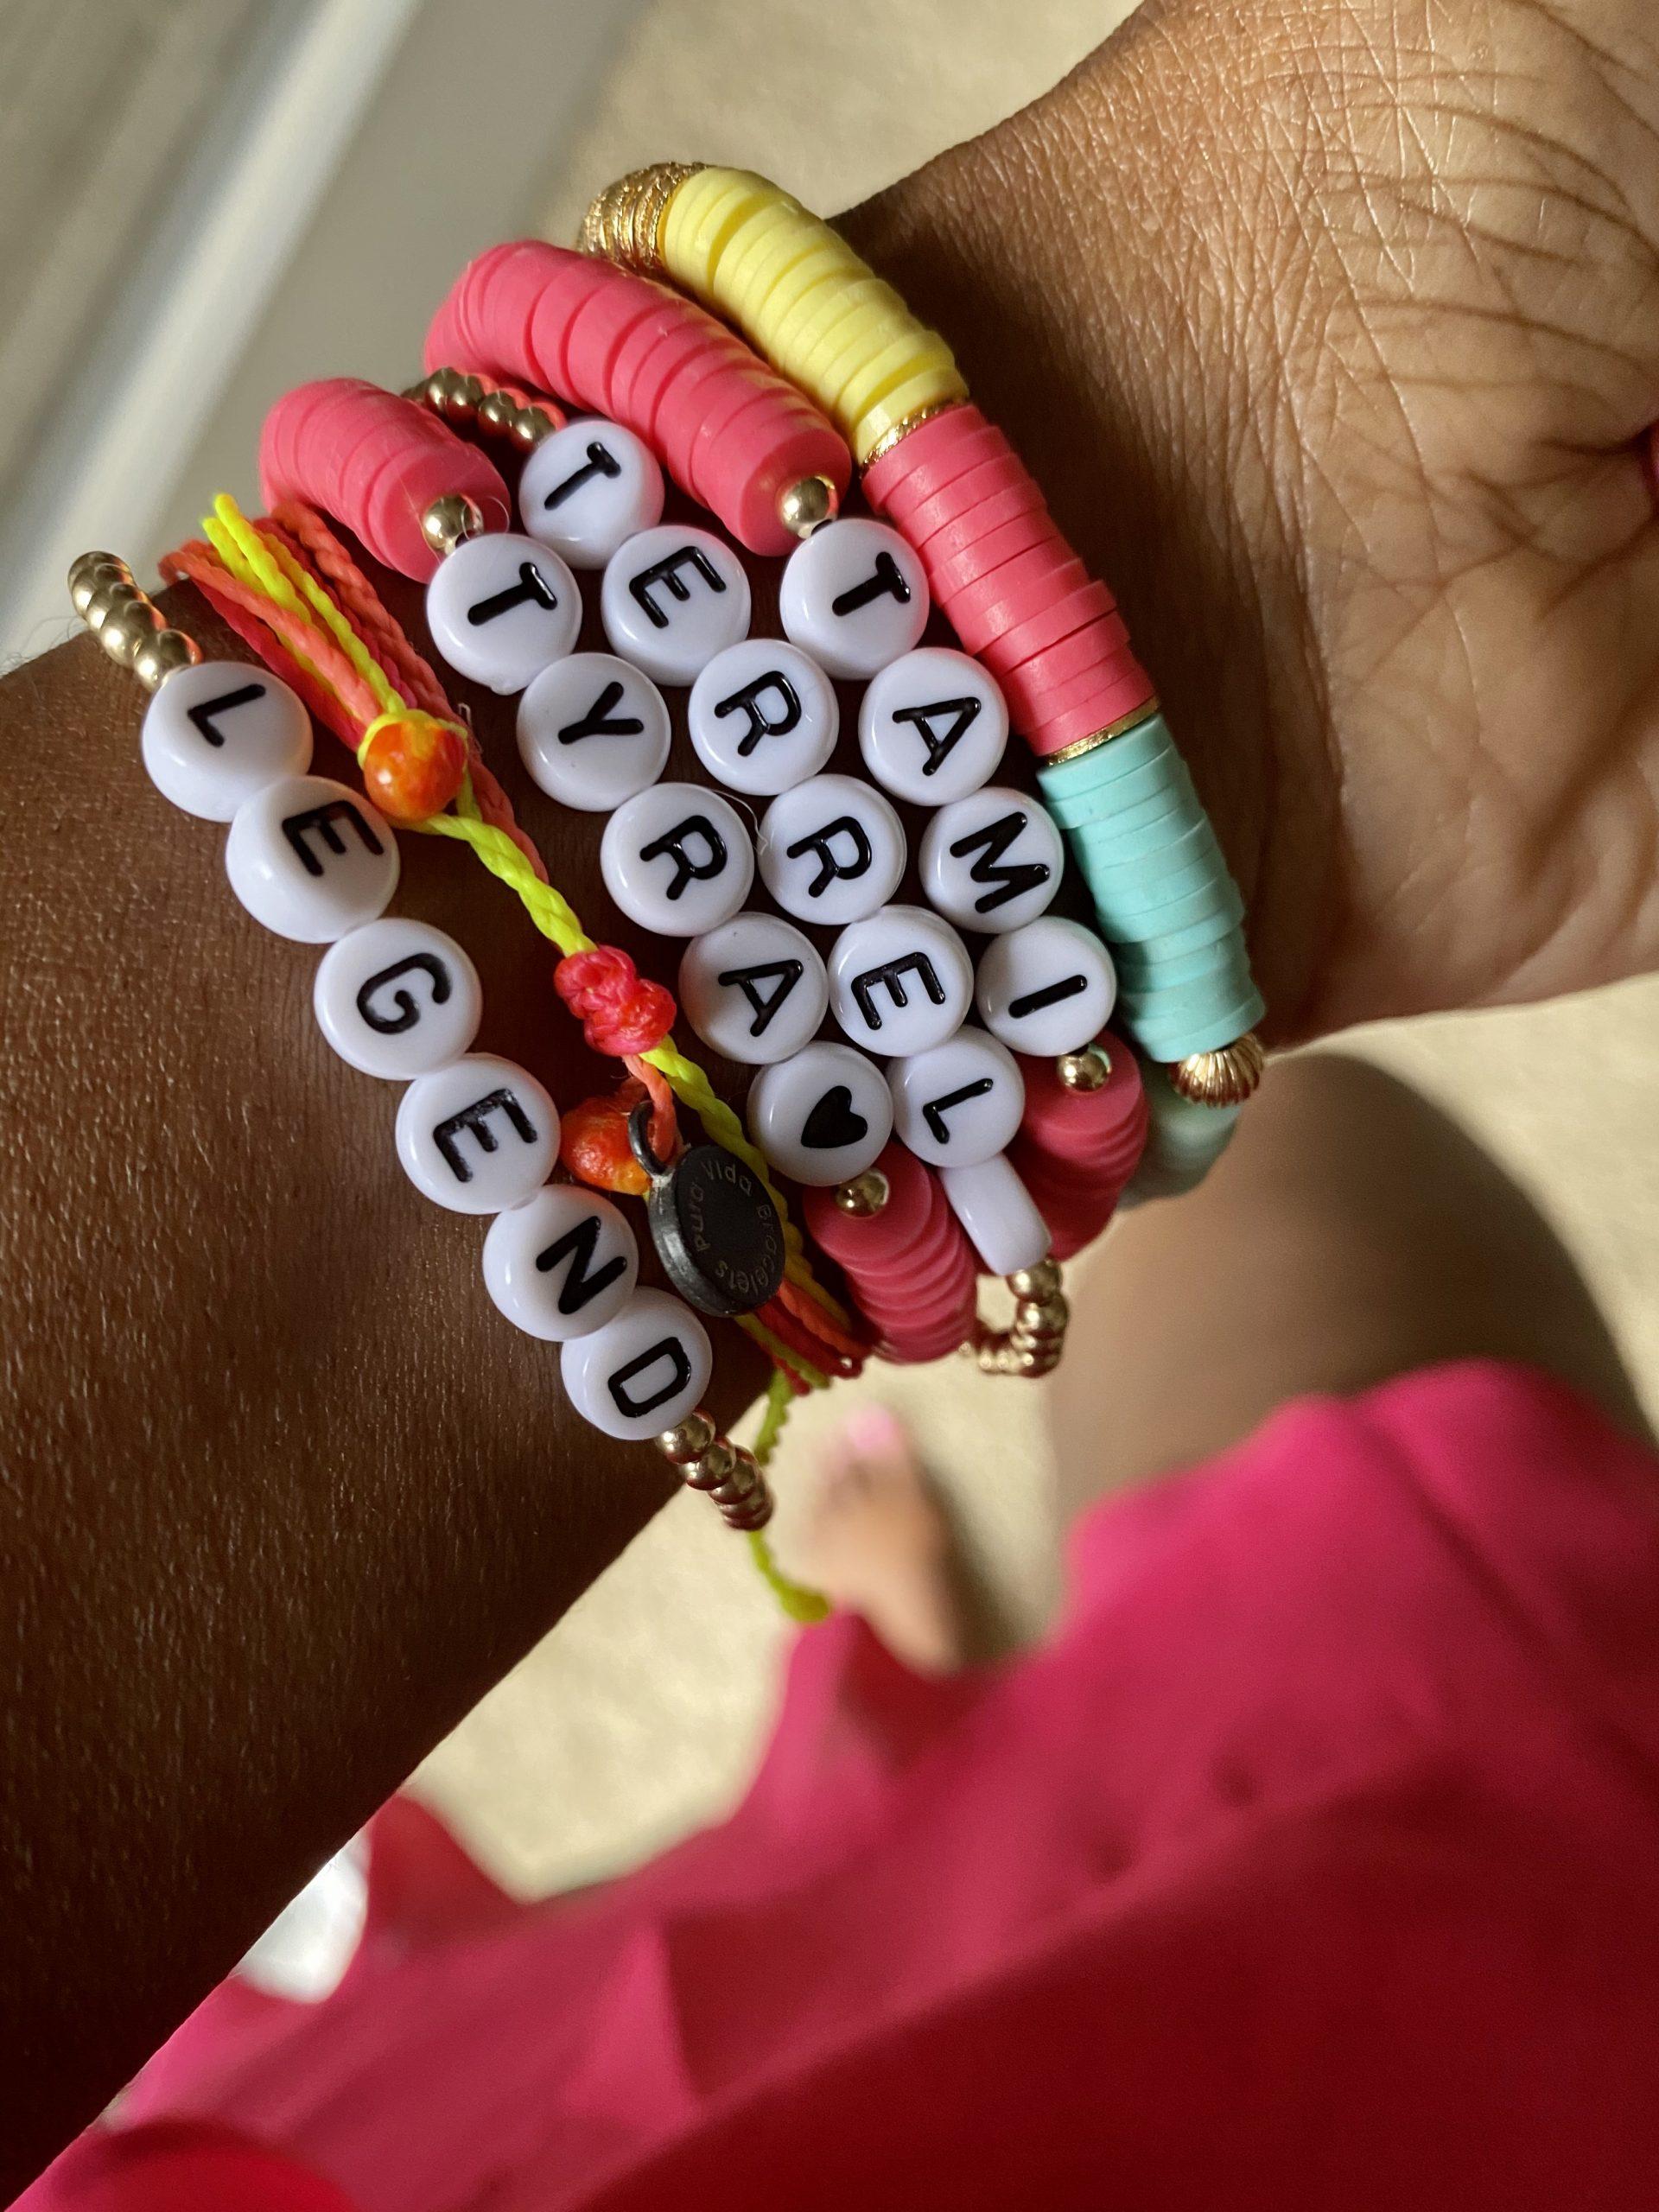 My Bowood Lane Name Bracelets